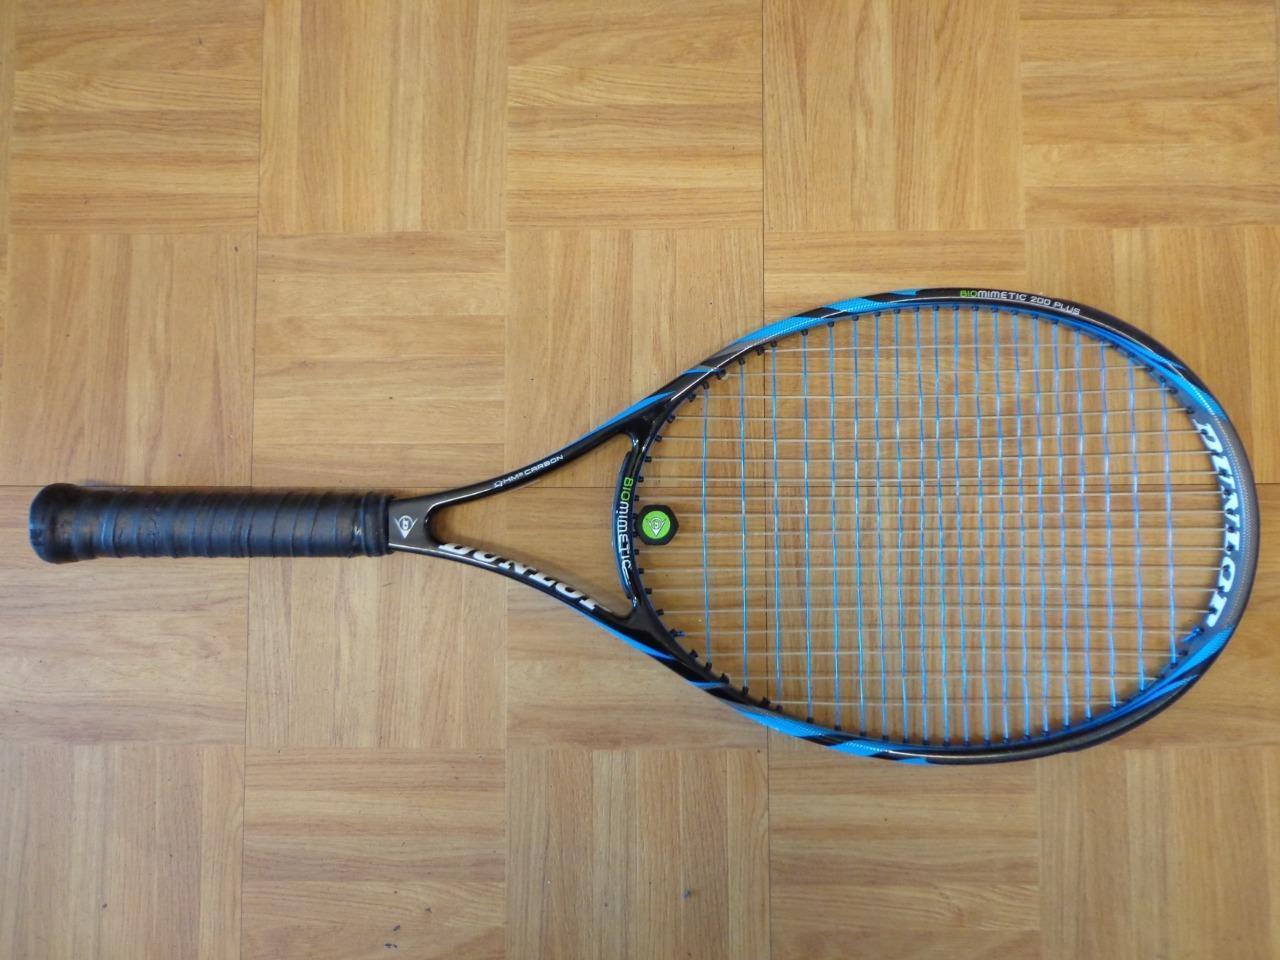 Dunlop Biomimetic 200 PLUS 100 head 4 3/8 grip Tennis Racquet